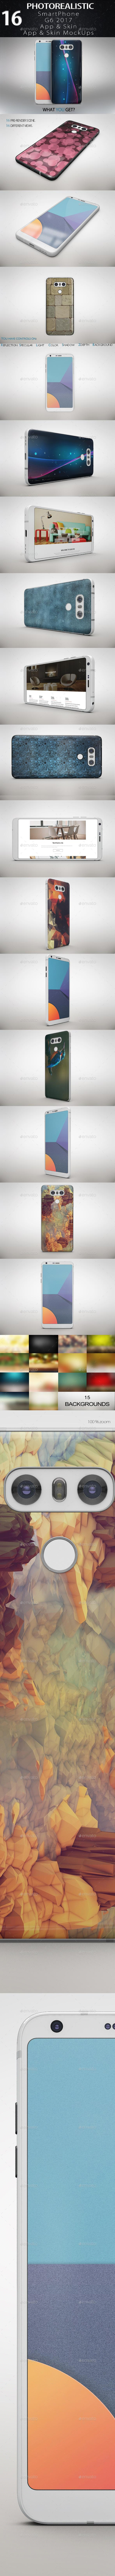 SmartPhone G6 2017 App & Skin MockUp - Product Mock-Ups Graphics